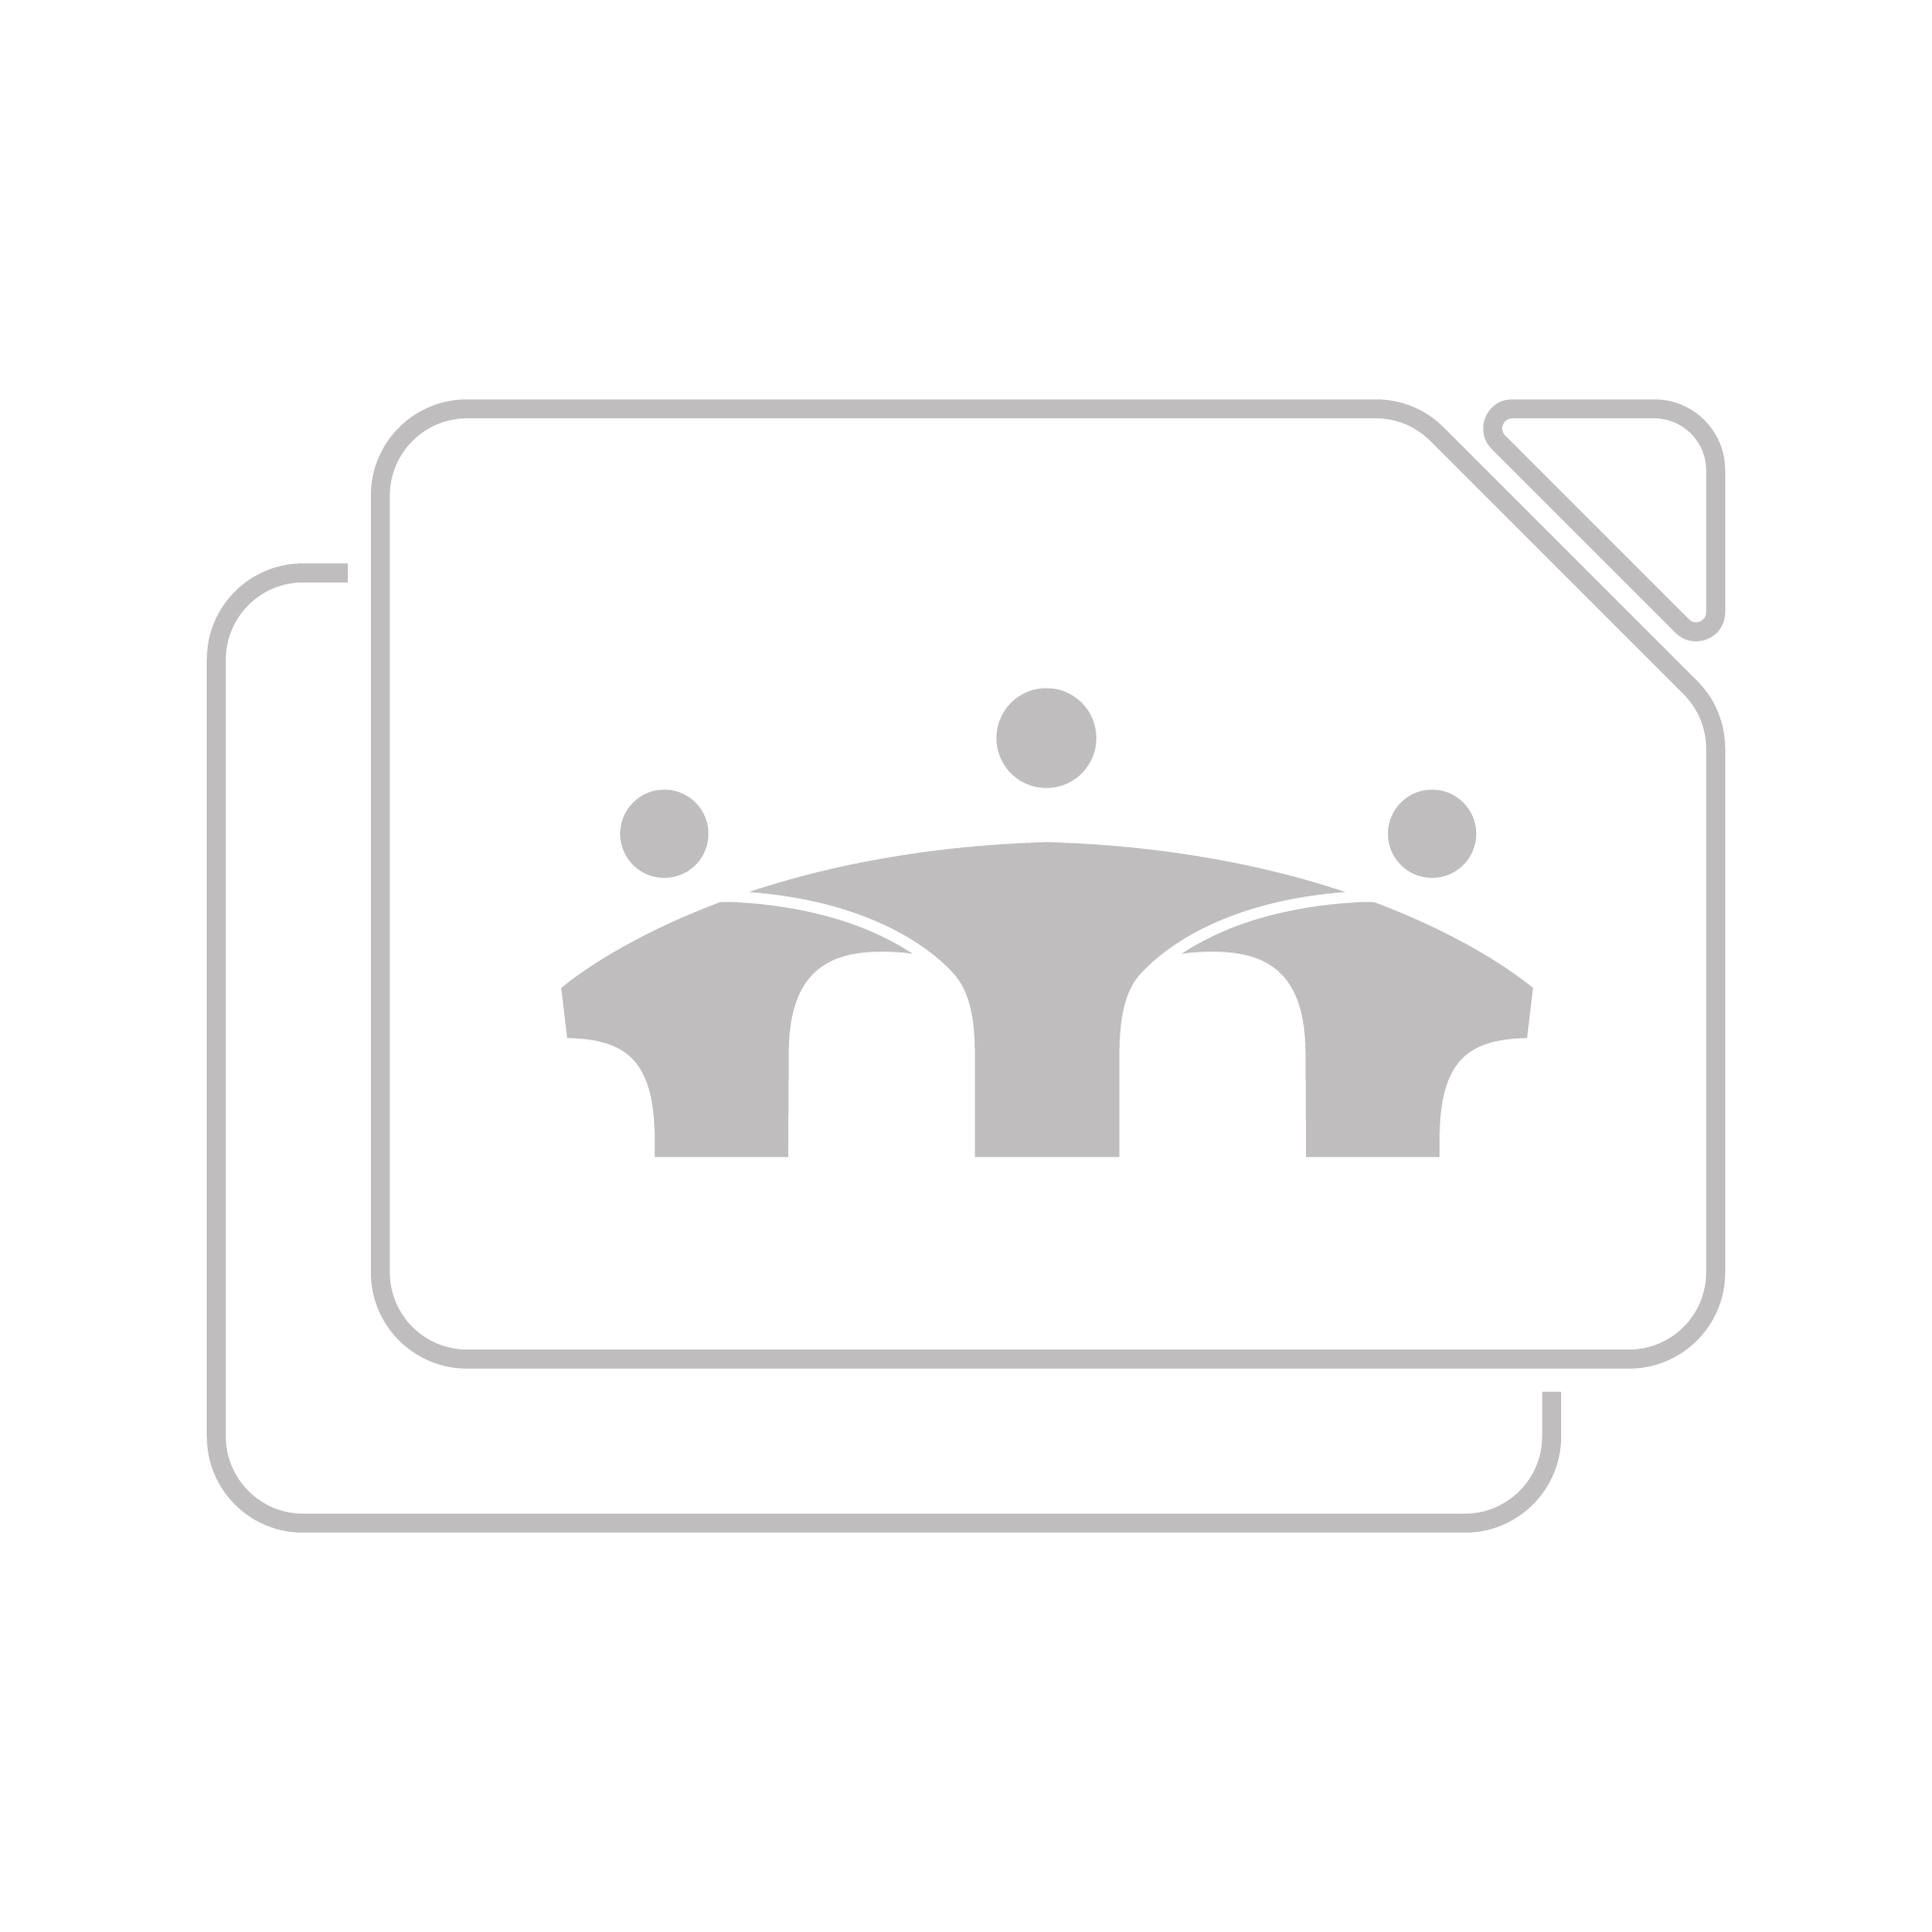 Seagate FireCuda 530 SSD with Heatsink 4TB